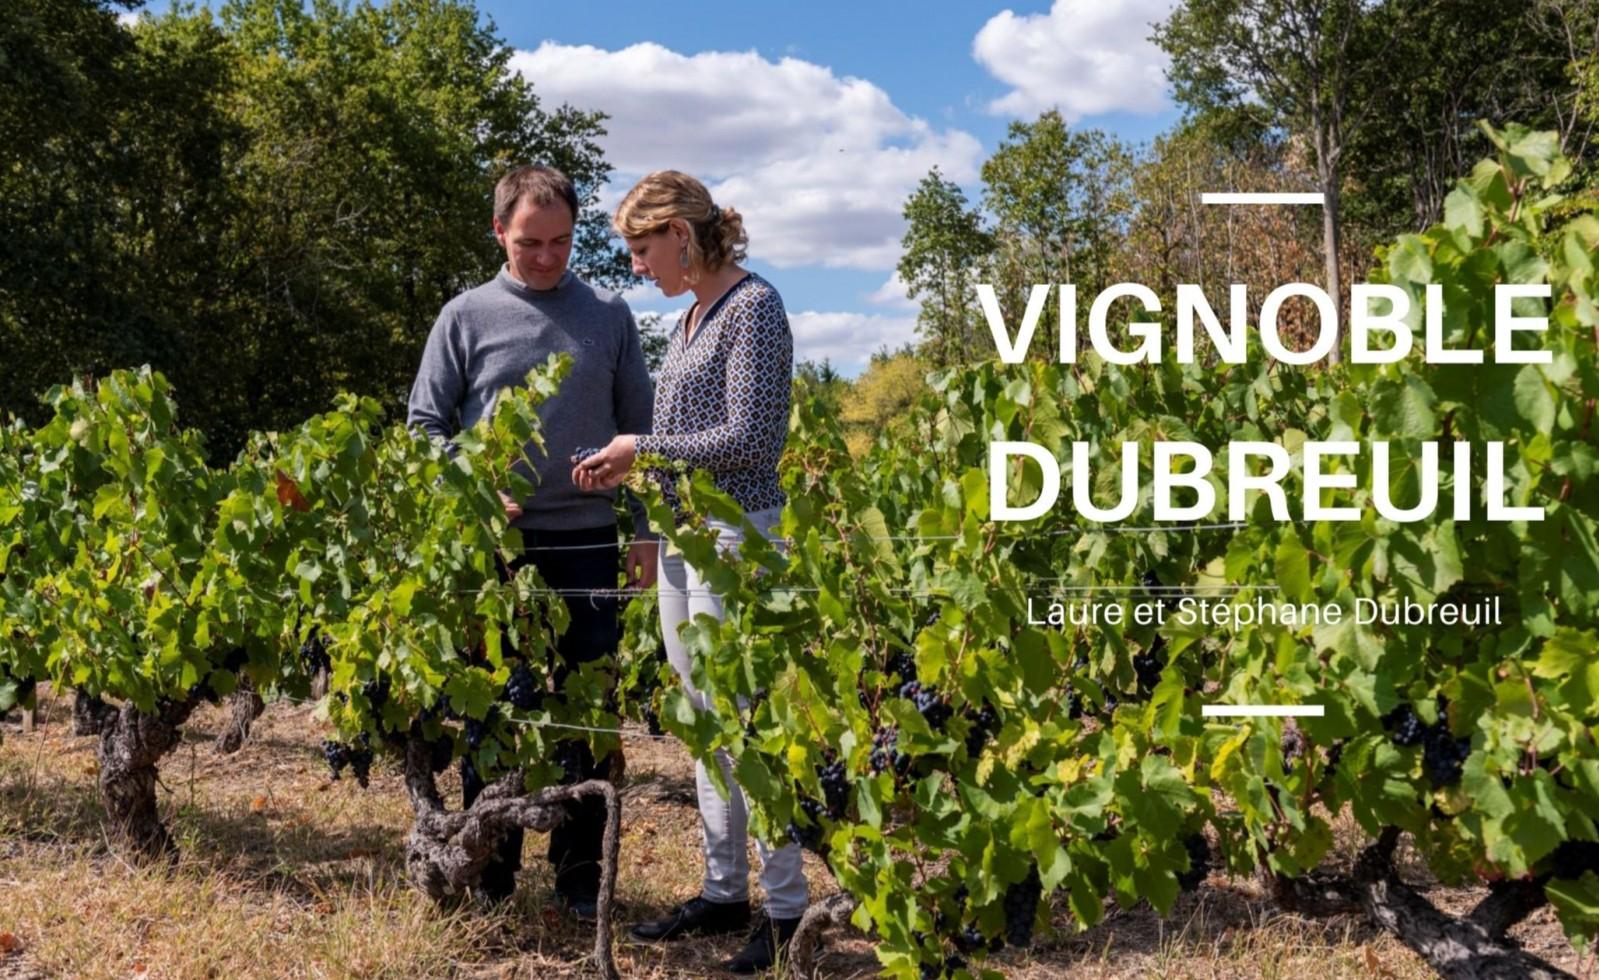 Vignoble Dubreuil